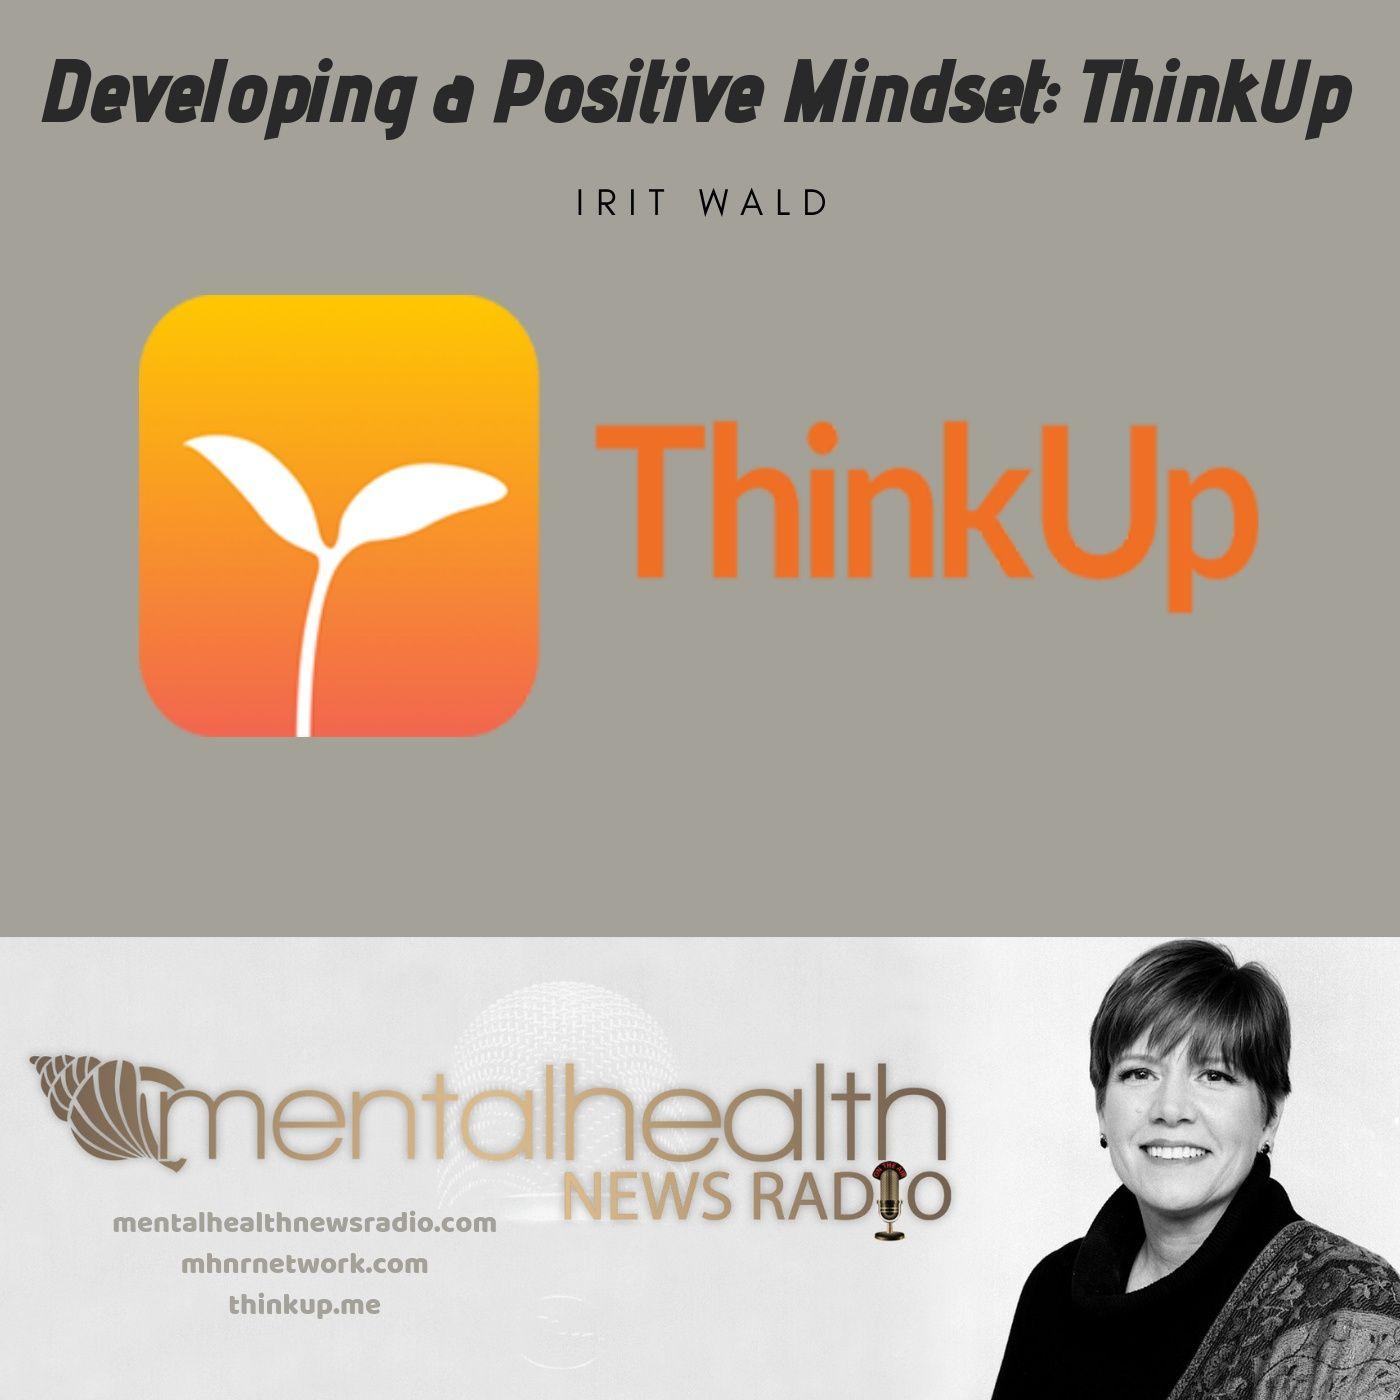 Mental Health News Radio - Developing a Positive Mindset: ThinkUp